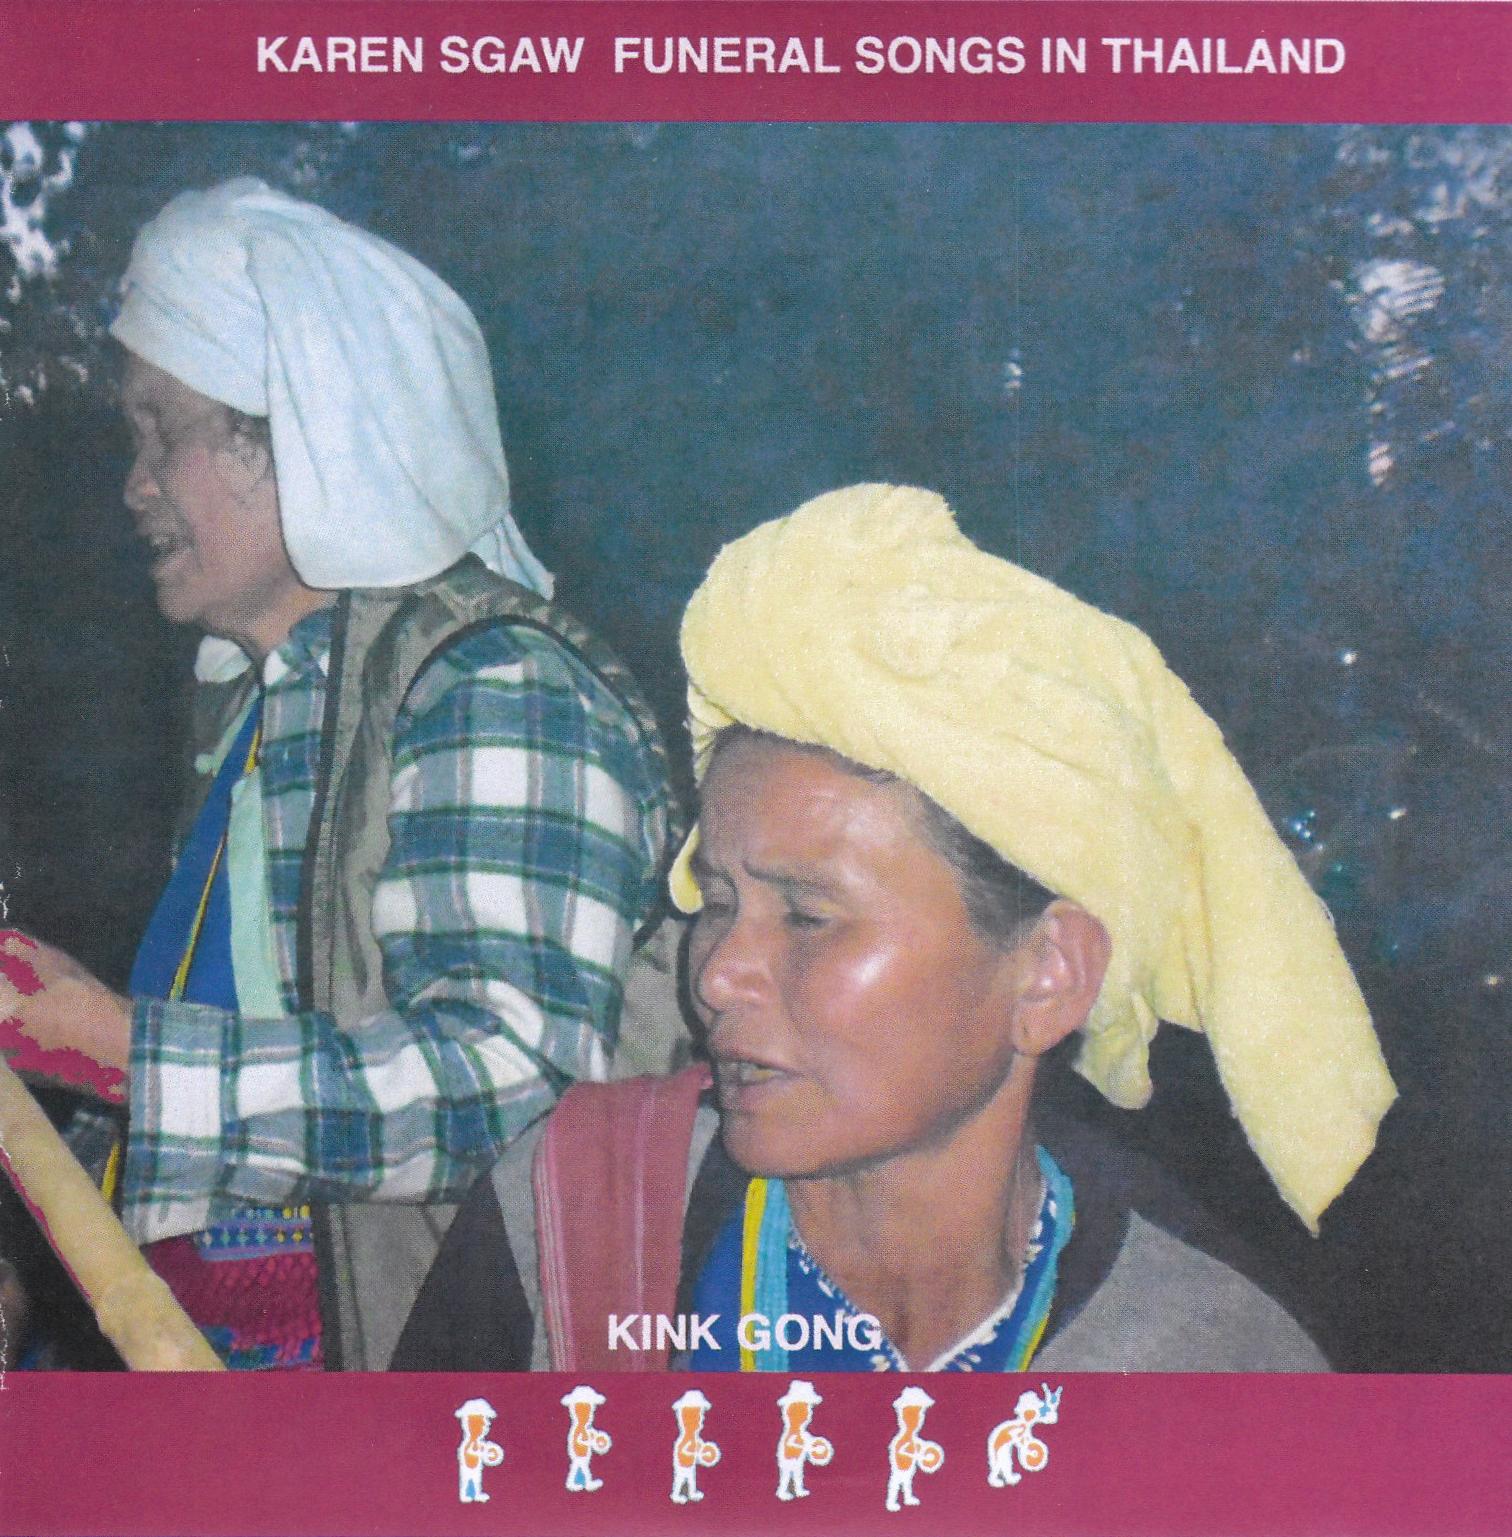 KINK GONG - Karen Sgaw Funeral Songs In Thailand : CD-R